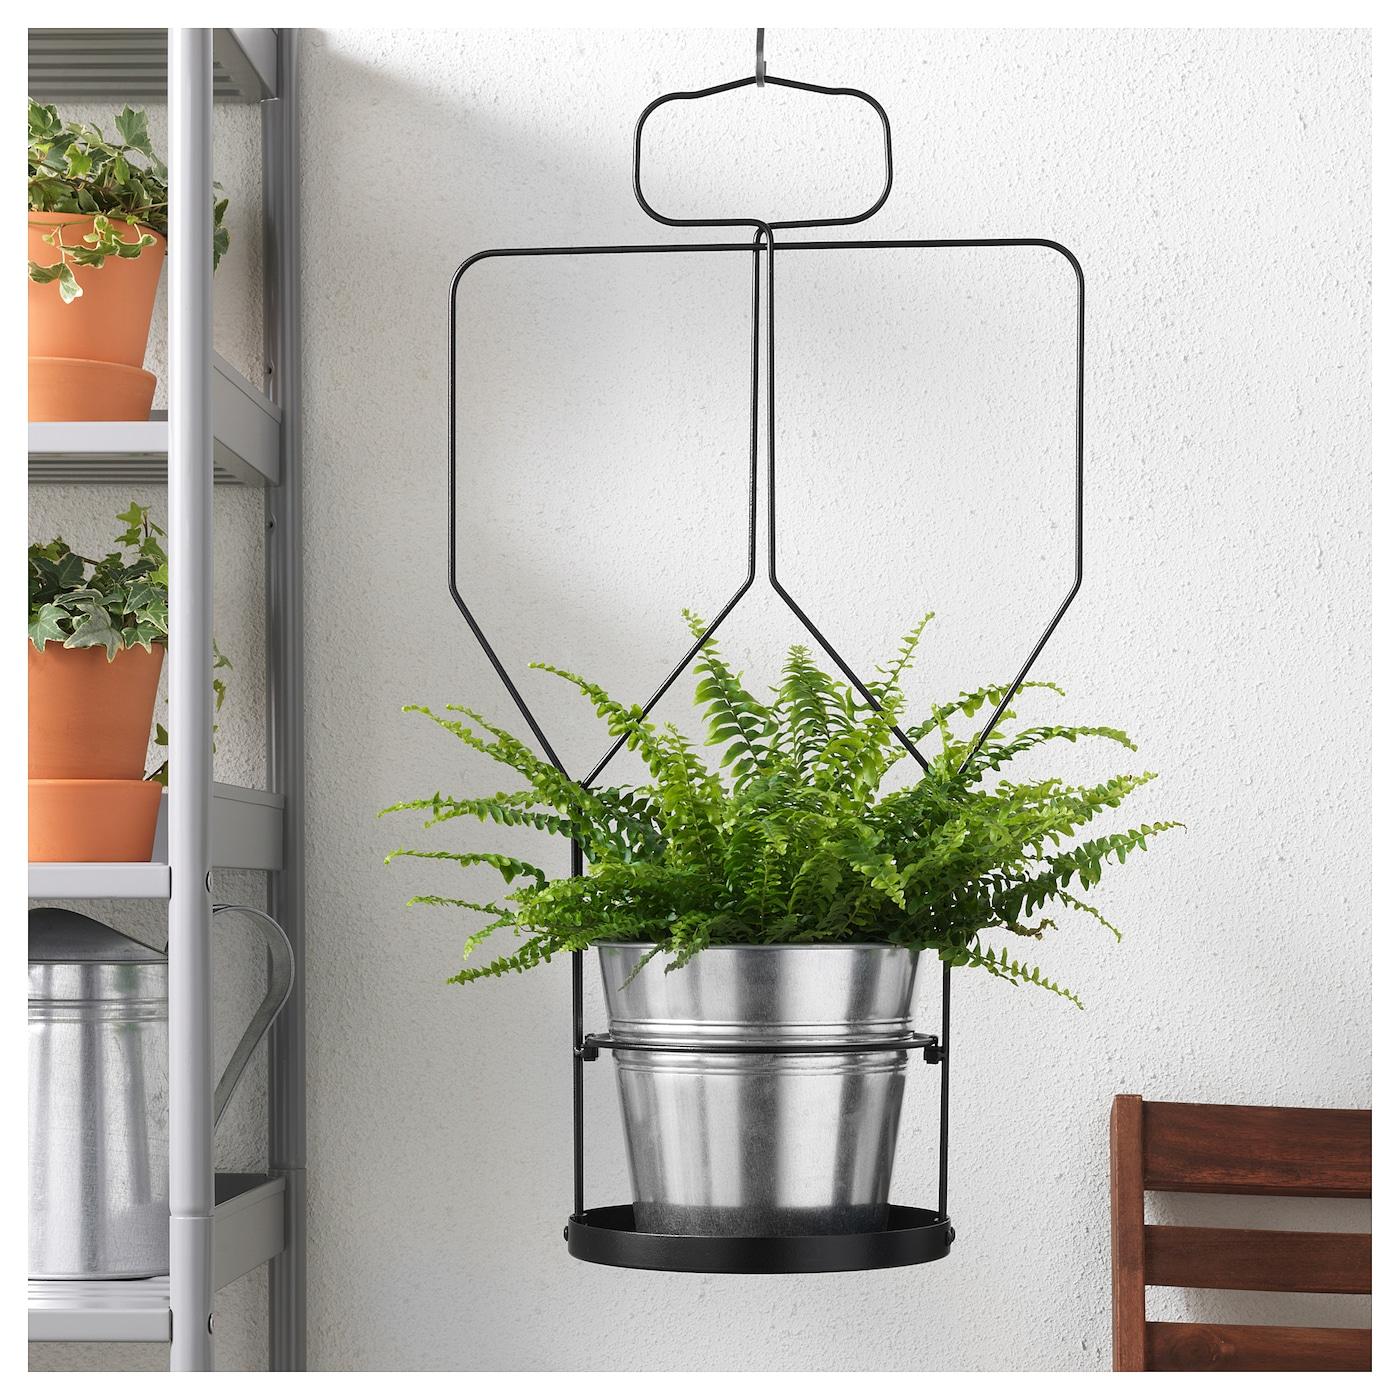 IKEA SOMMAR 2018 Plant Pot Hanger With Trellis